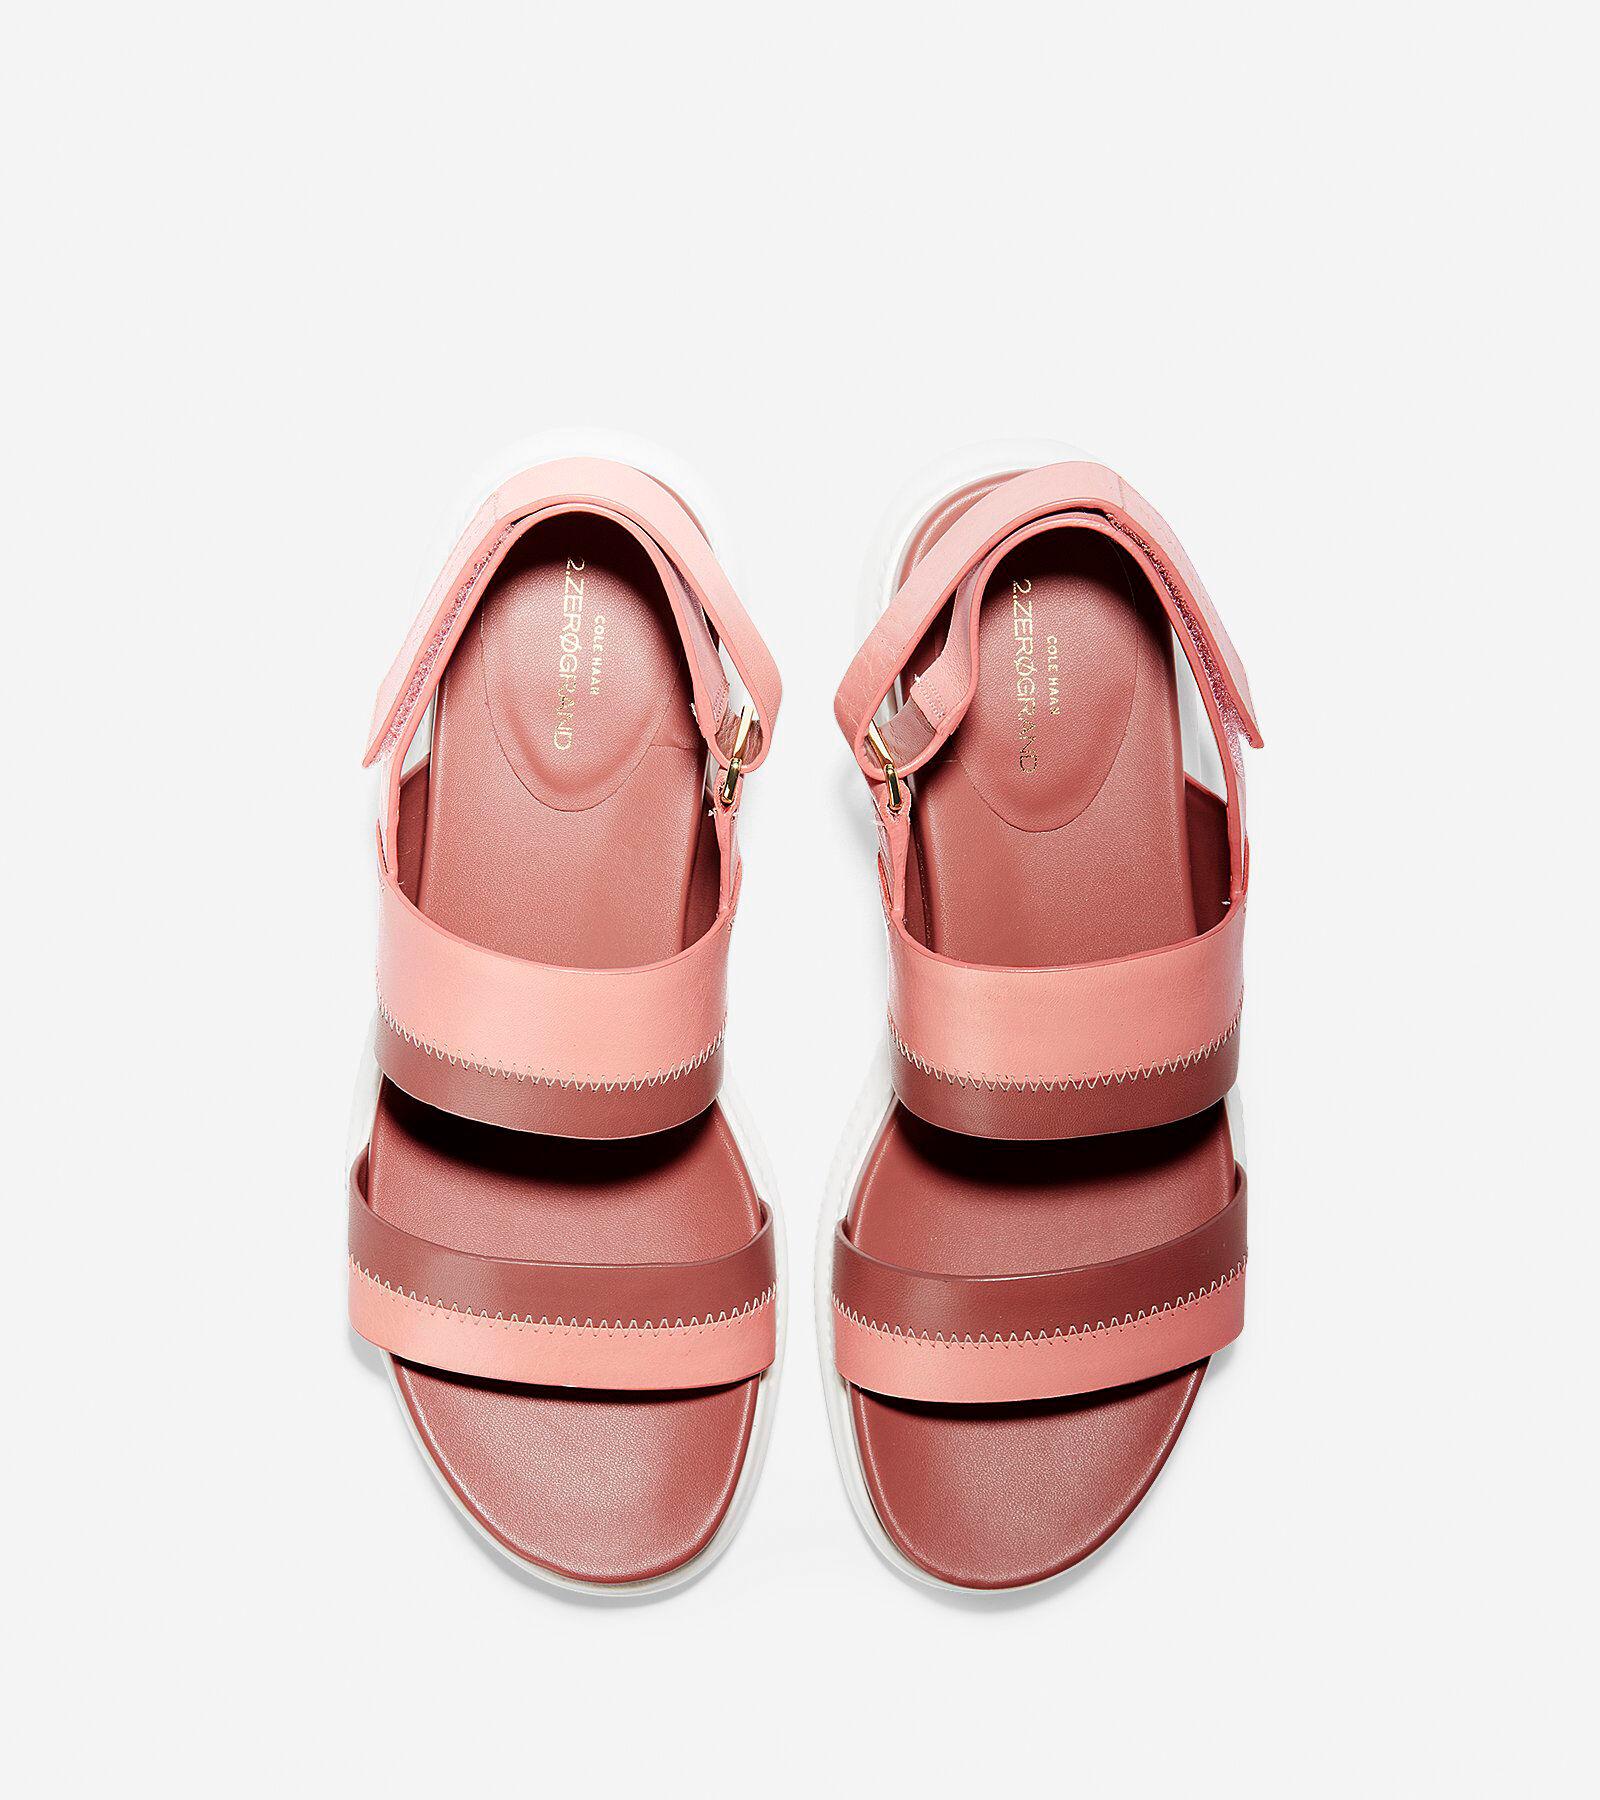 Donna 2.ZEROGRAND Slide Sandalo in Coral Almond Almond Almond   Cole Haan d4d169